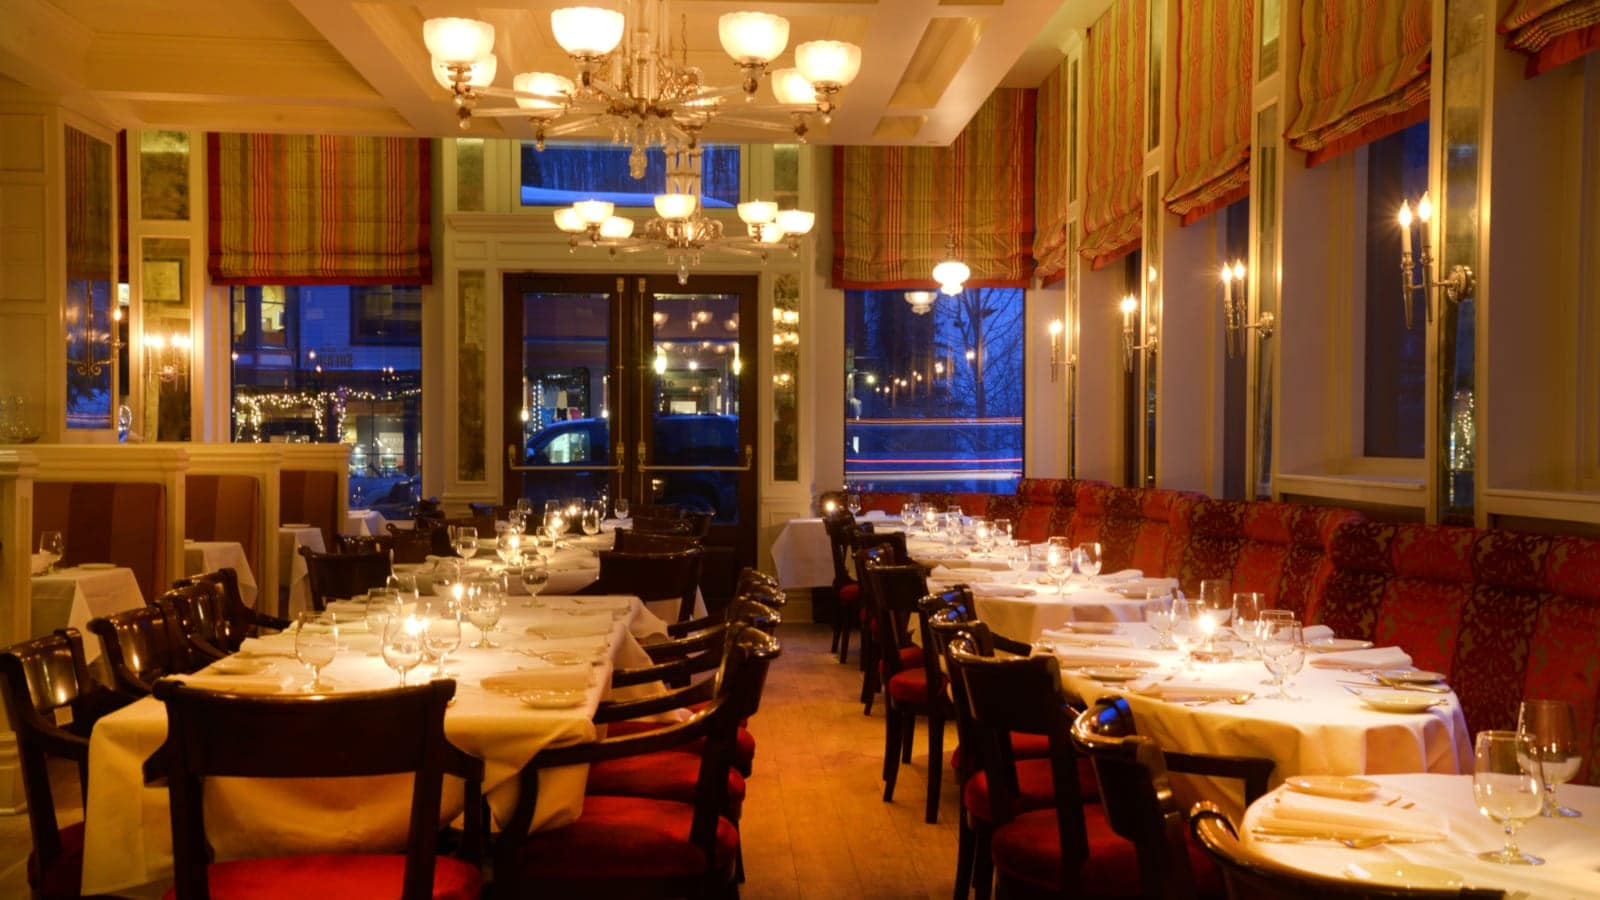 Chop House Restaurant at New Sheridan Telluride Dining Room